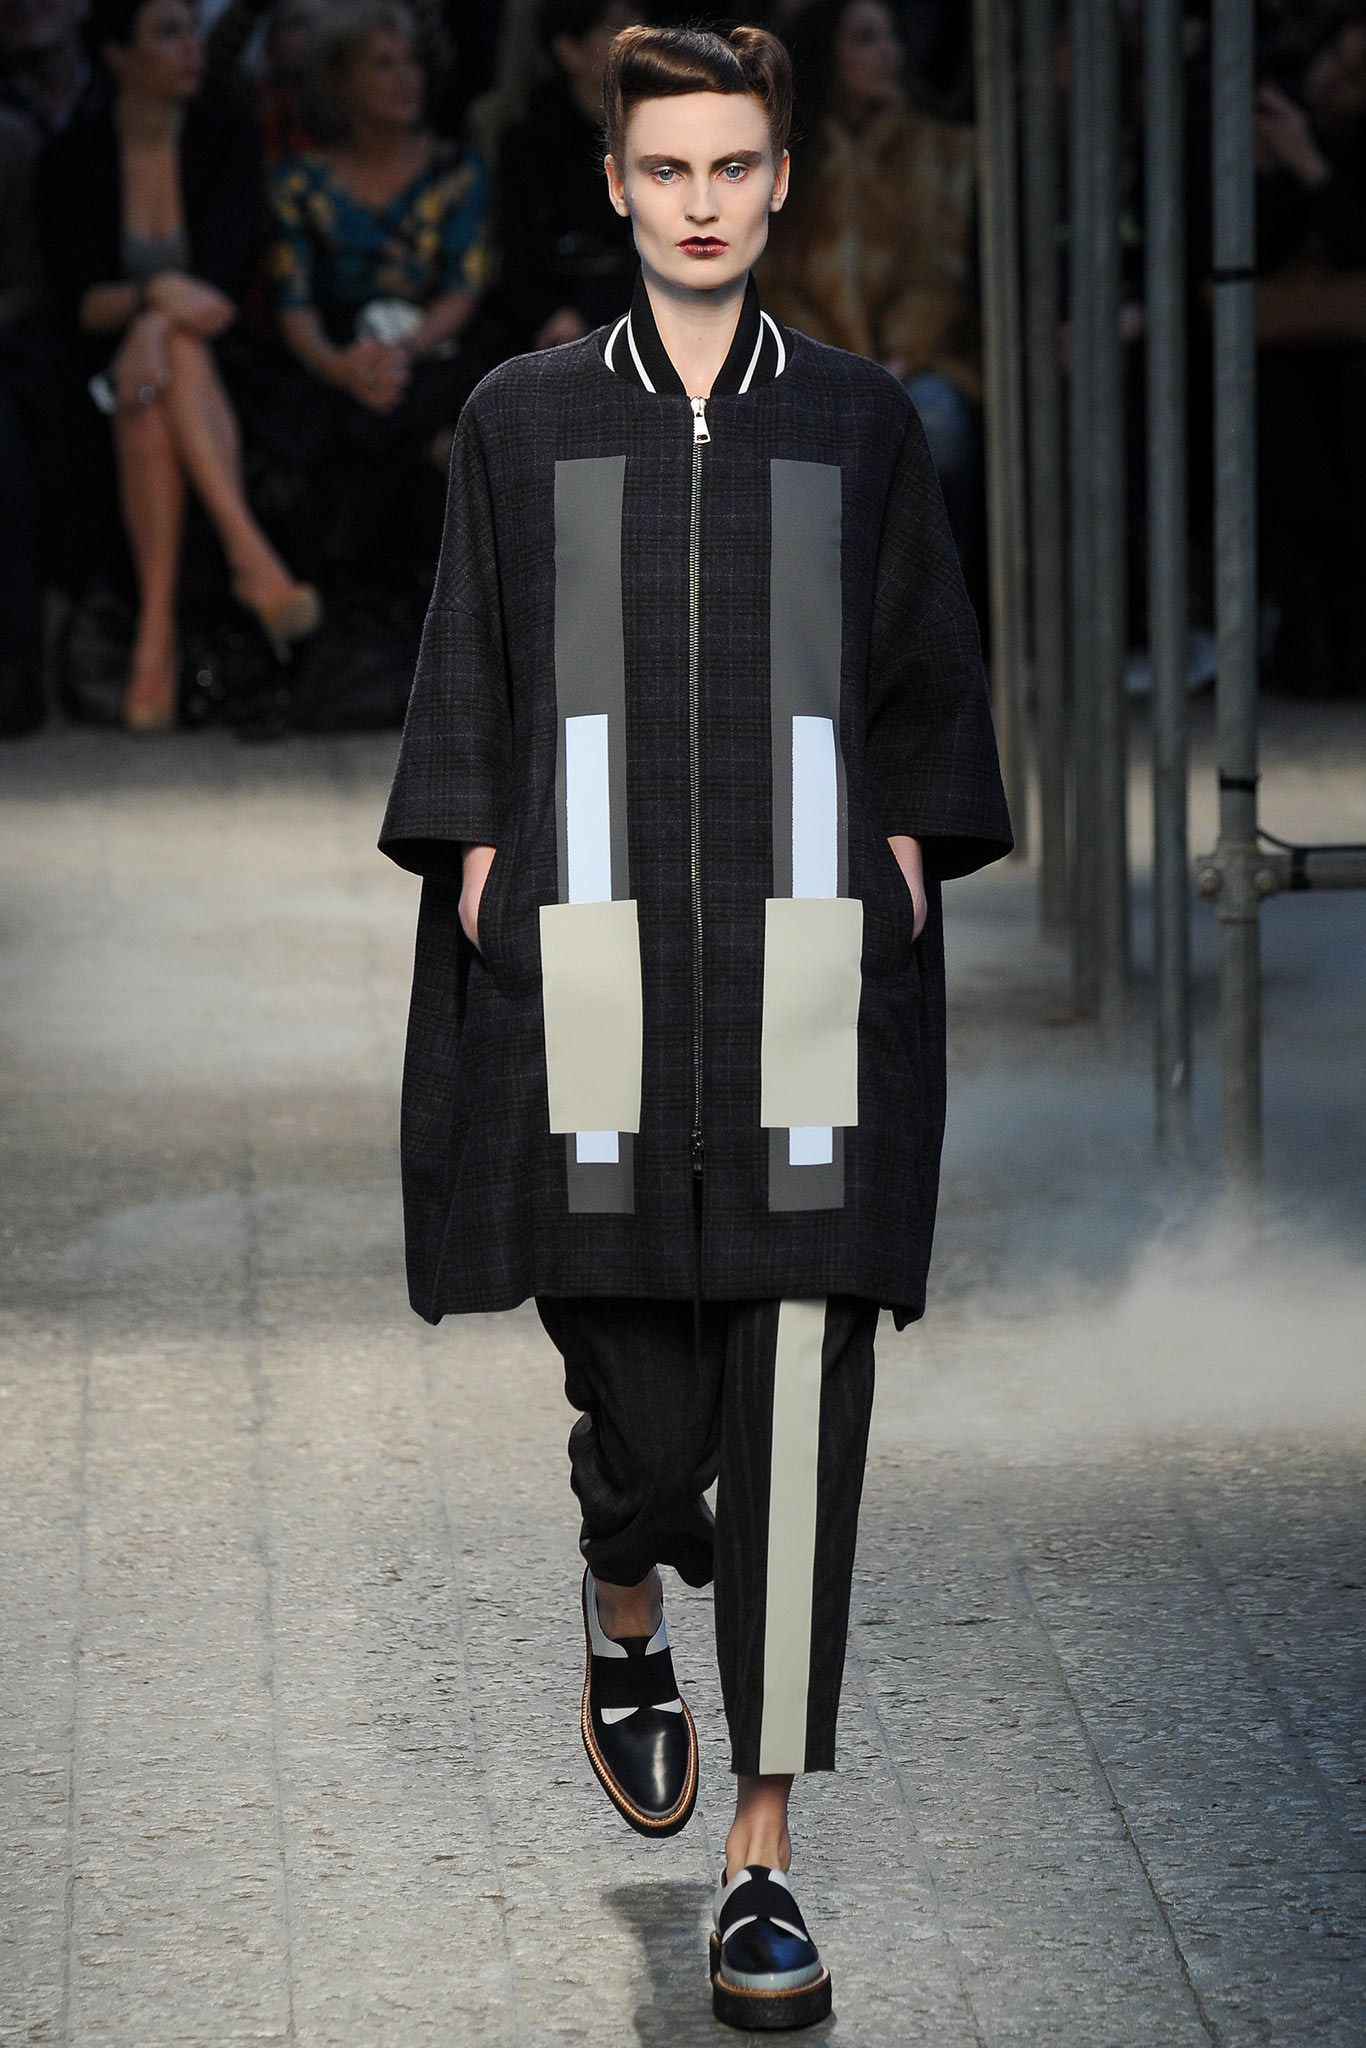 Antonio Marras Fall 2014 Ready-to-Wear Fashion Show